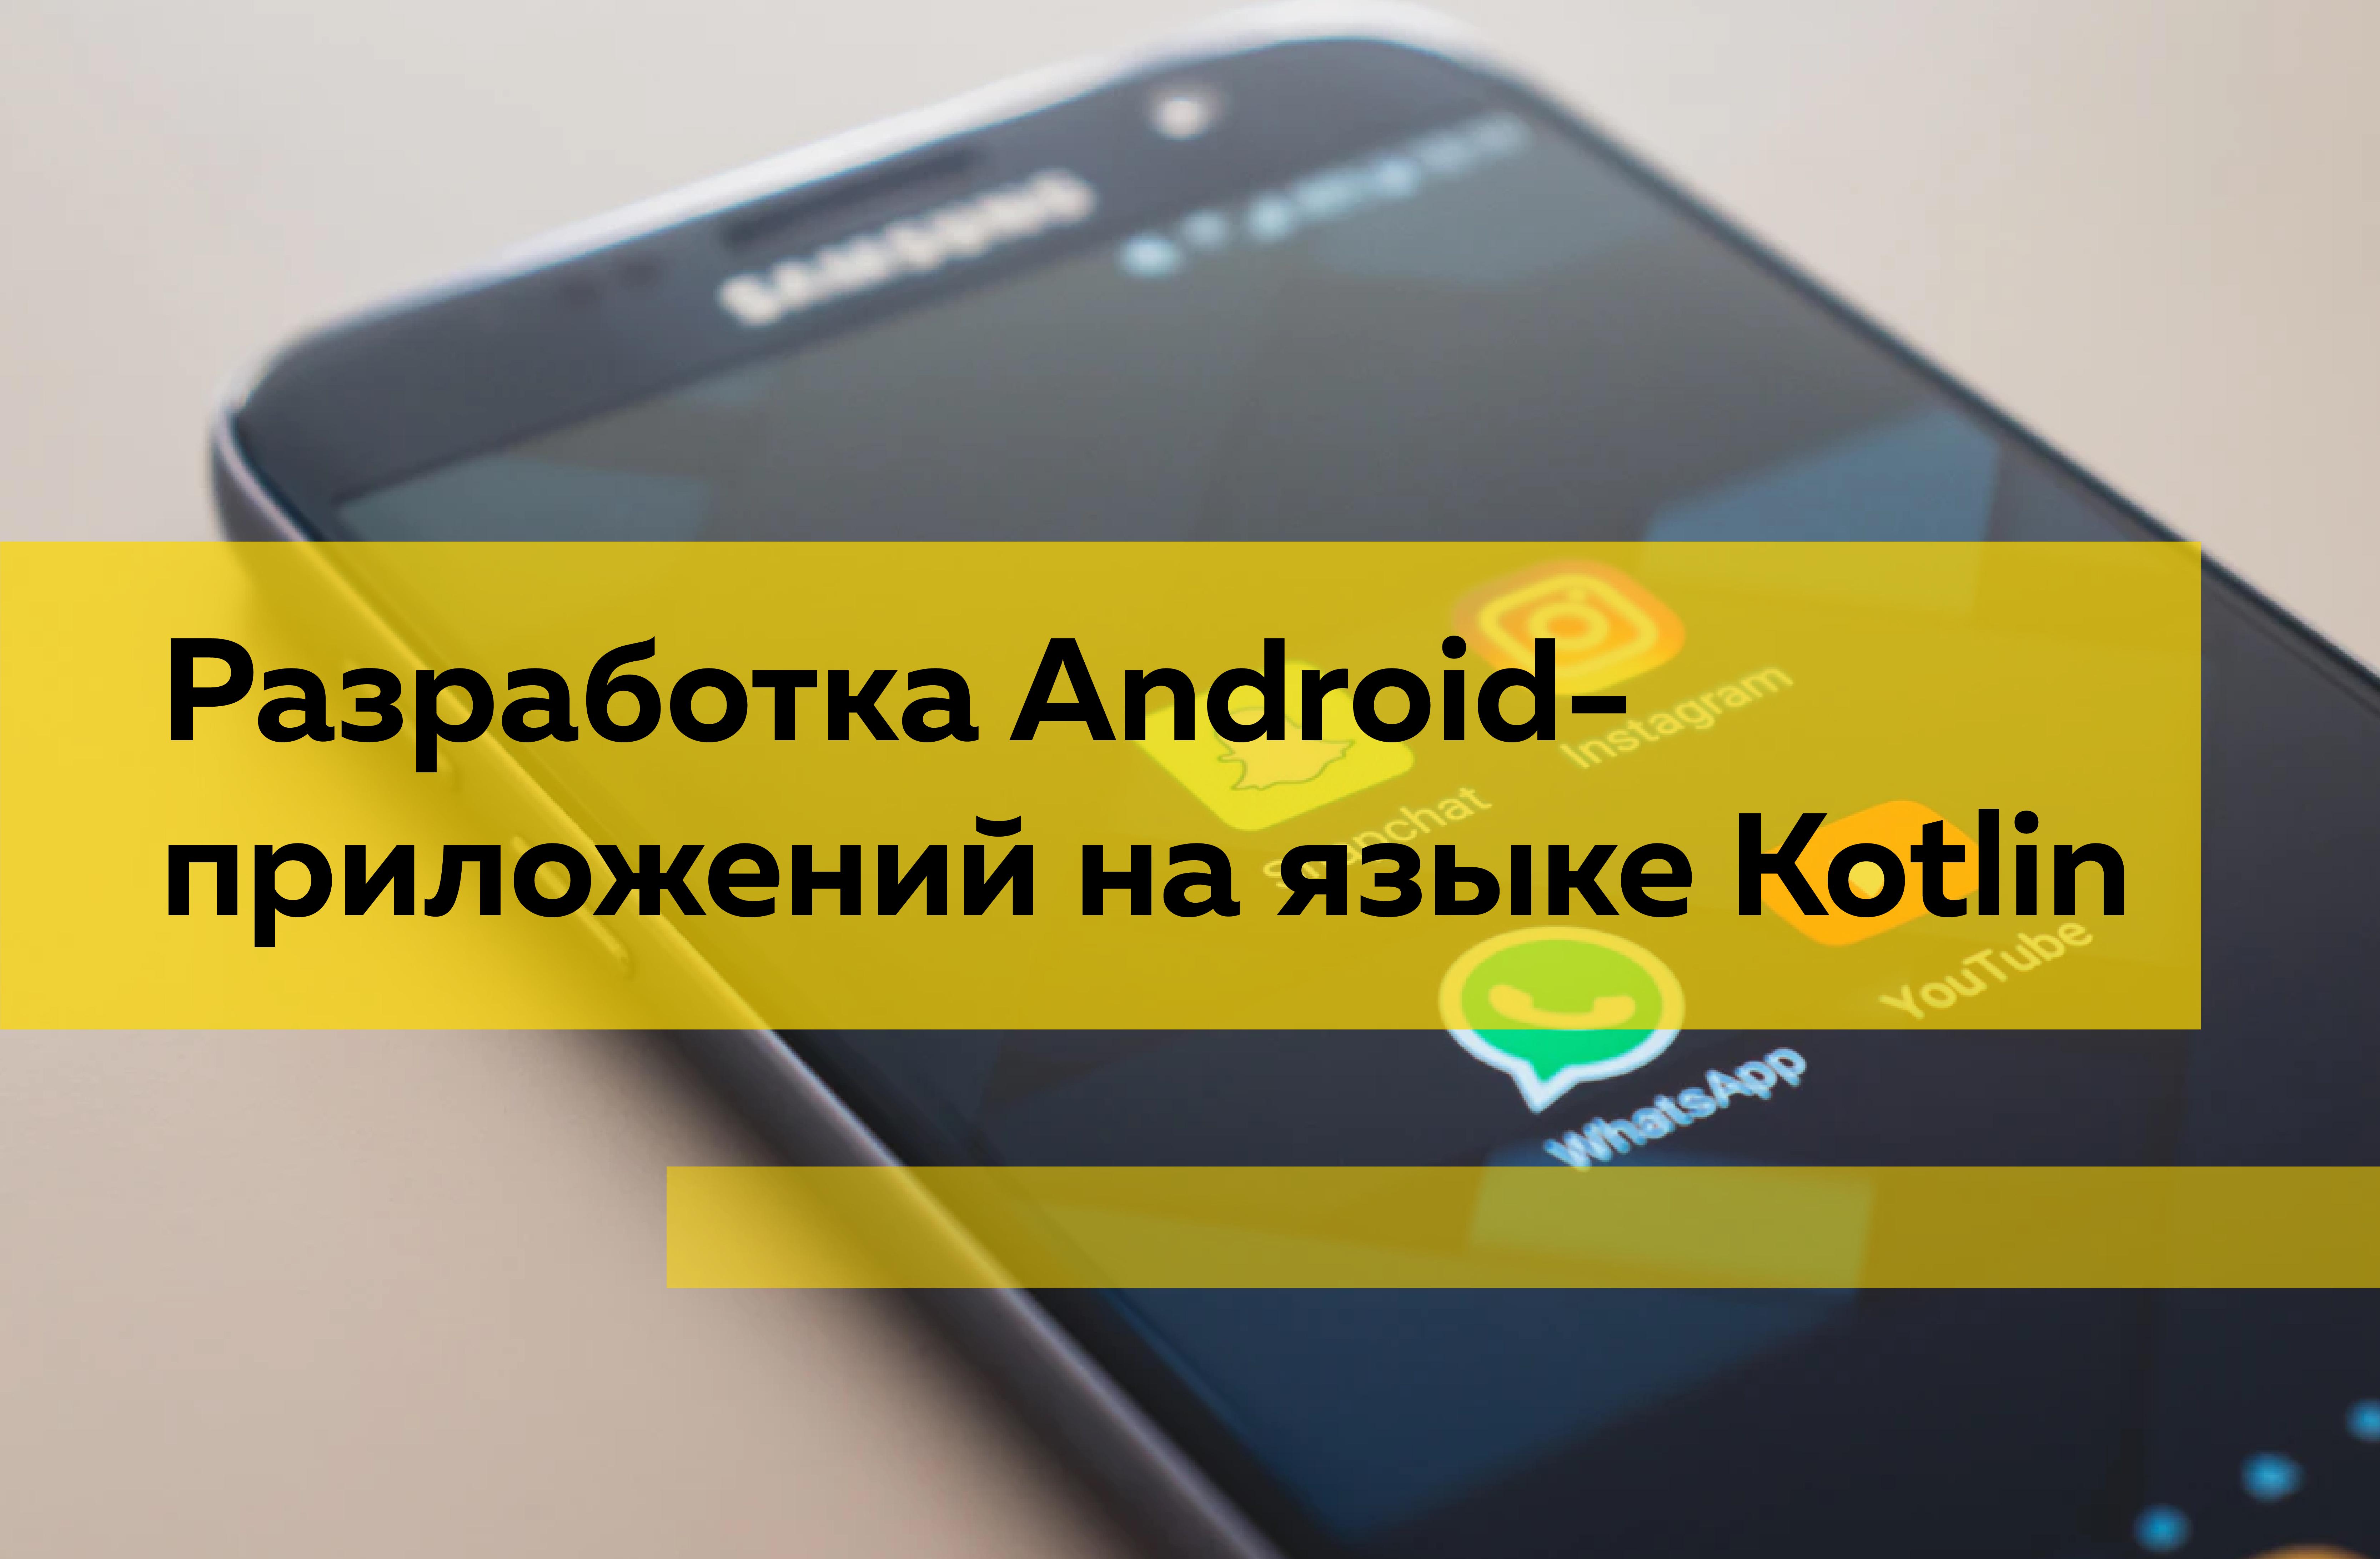 Разработка Android-приложений на языке Kotlin